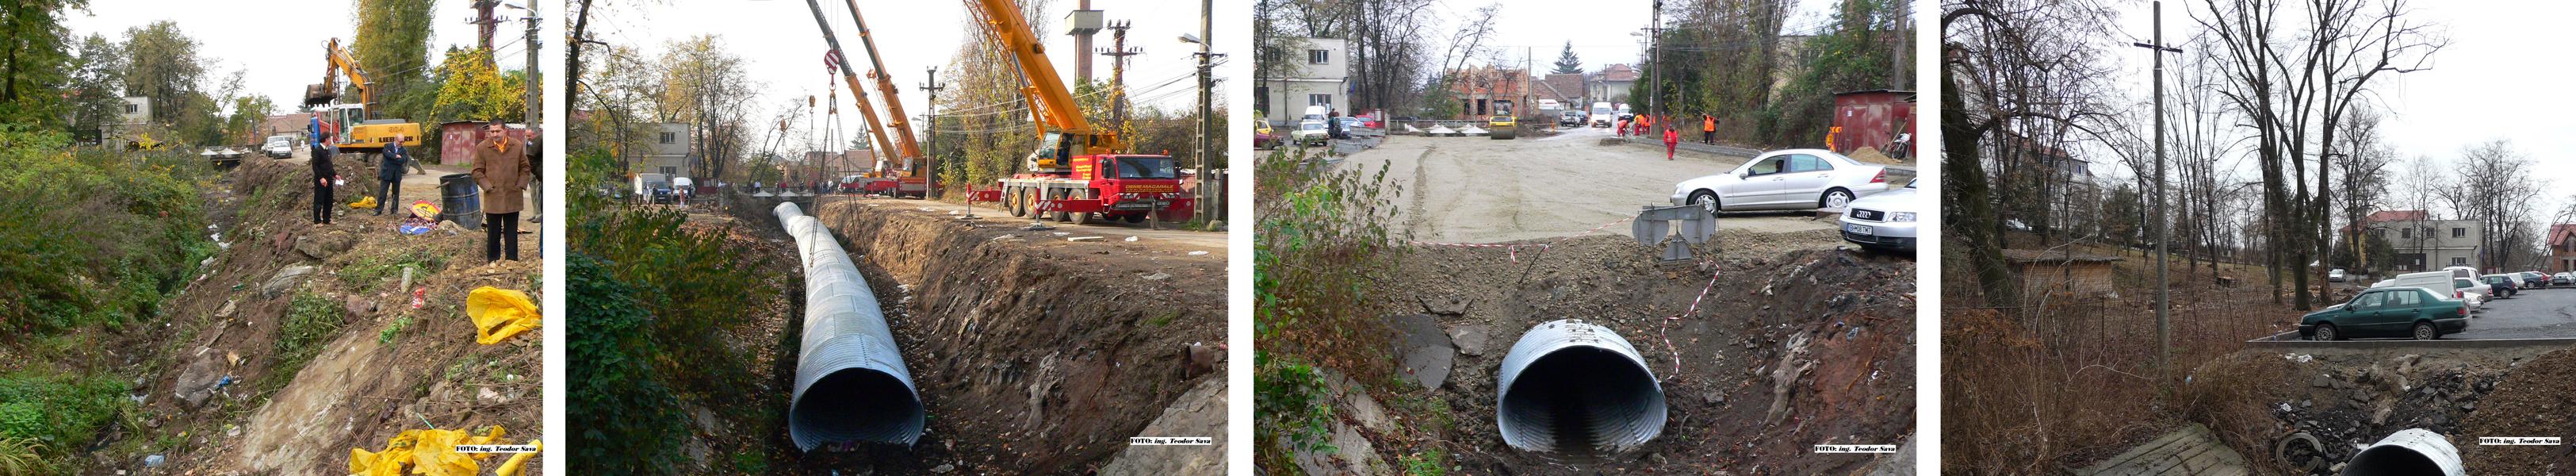 Structuri metalice prefabricate pentru drumuri si poduri TUBO TRADE PROIECT - Poza 49